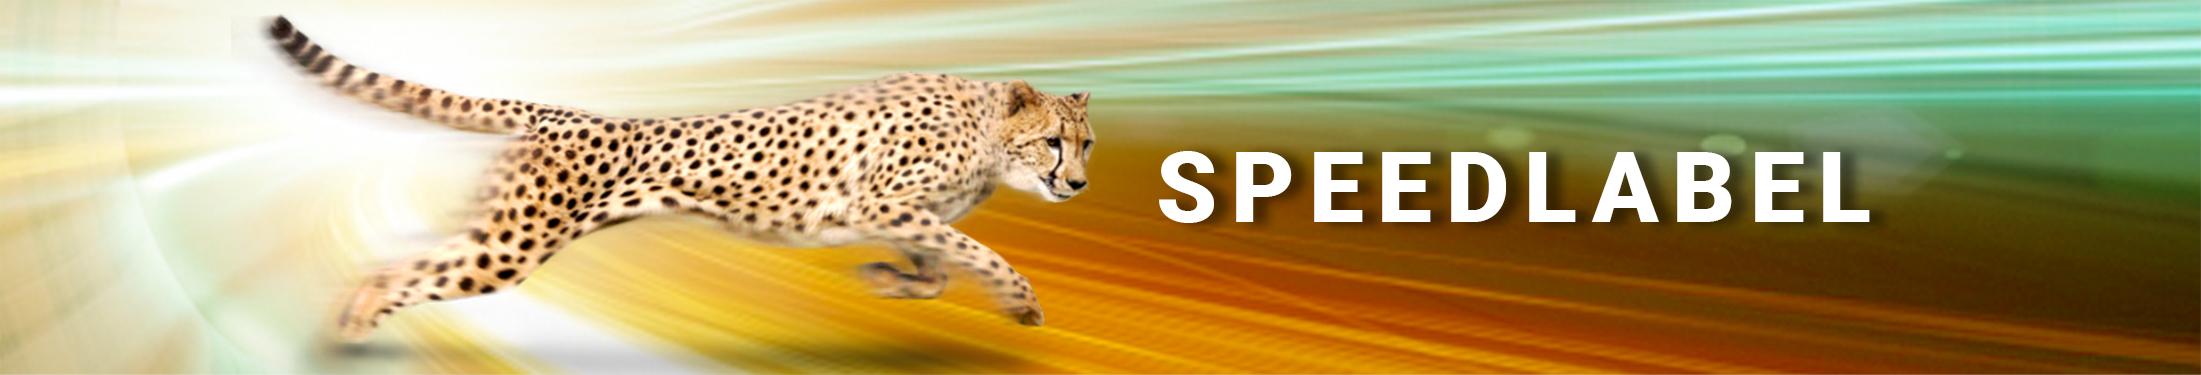 Speedlabel Service Innovastore International